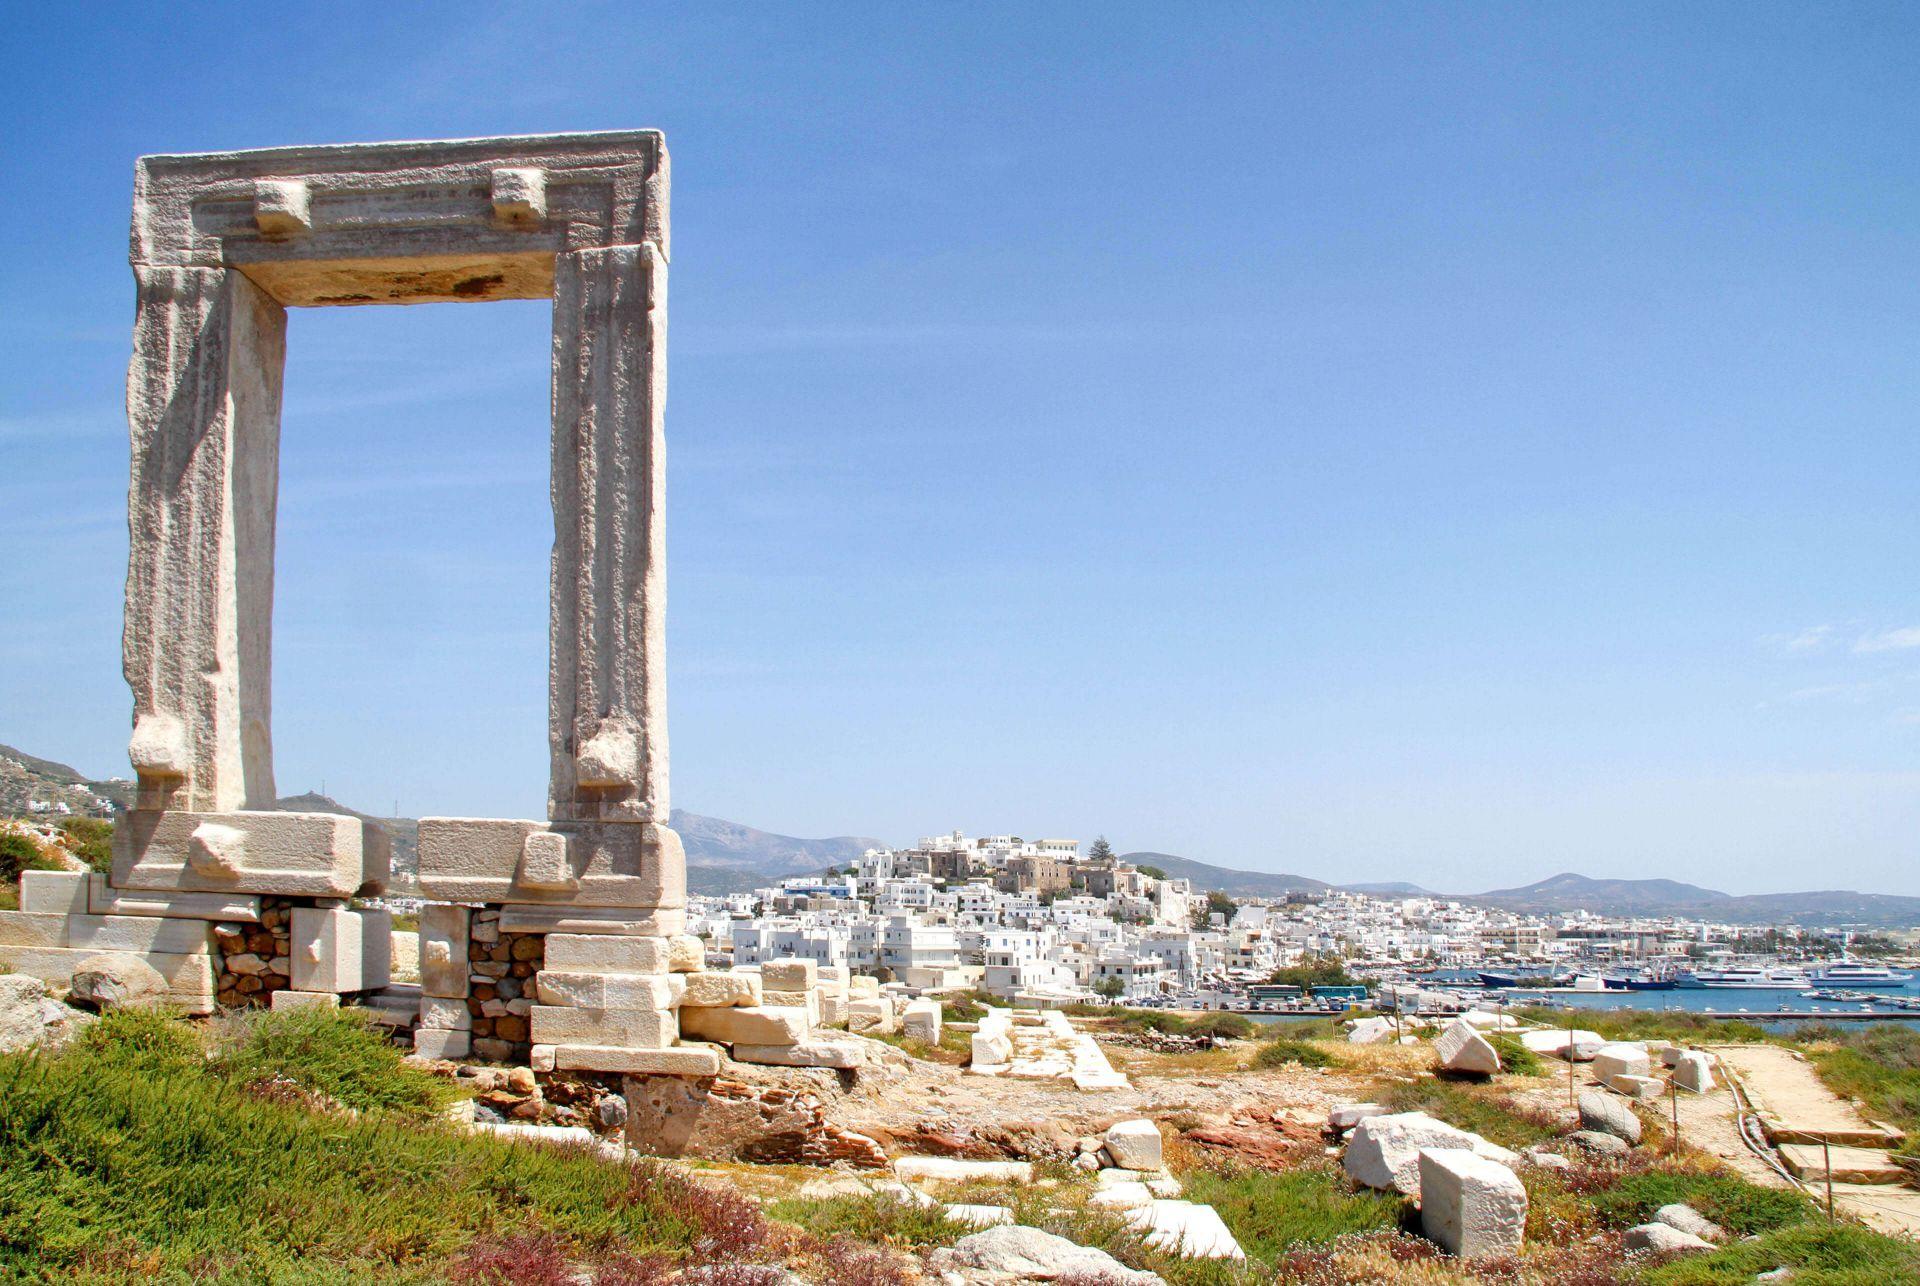 Naxos island: Portara, the landmark of Naxos